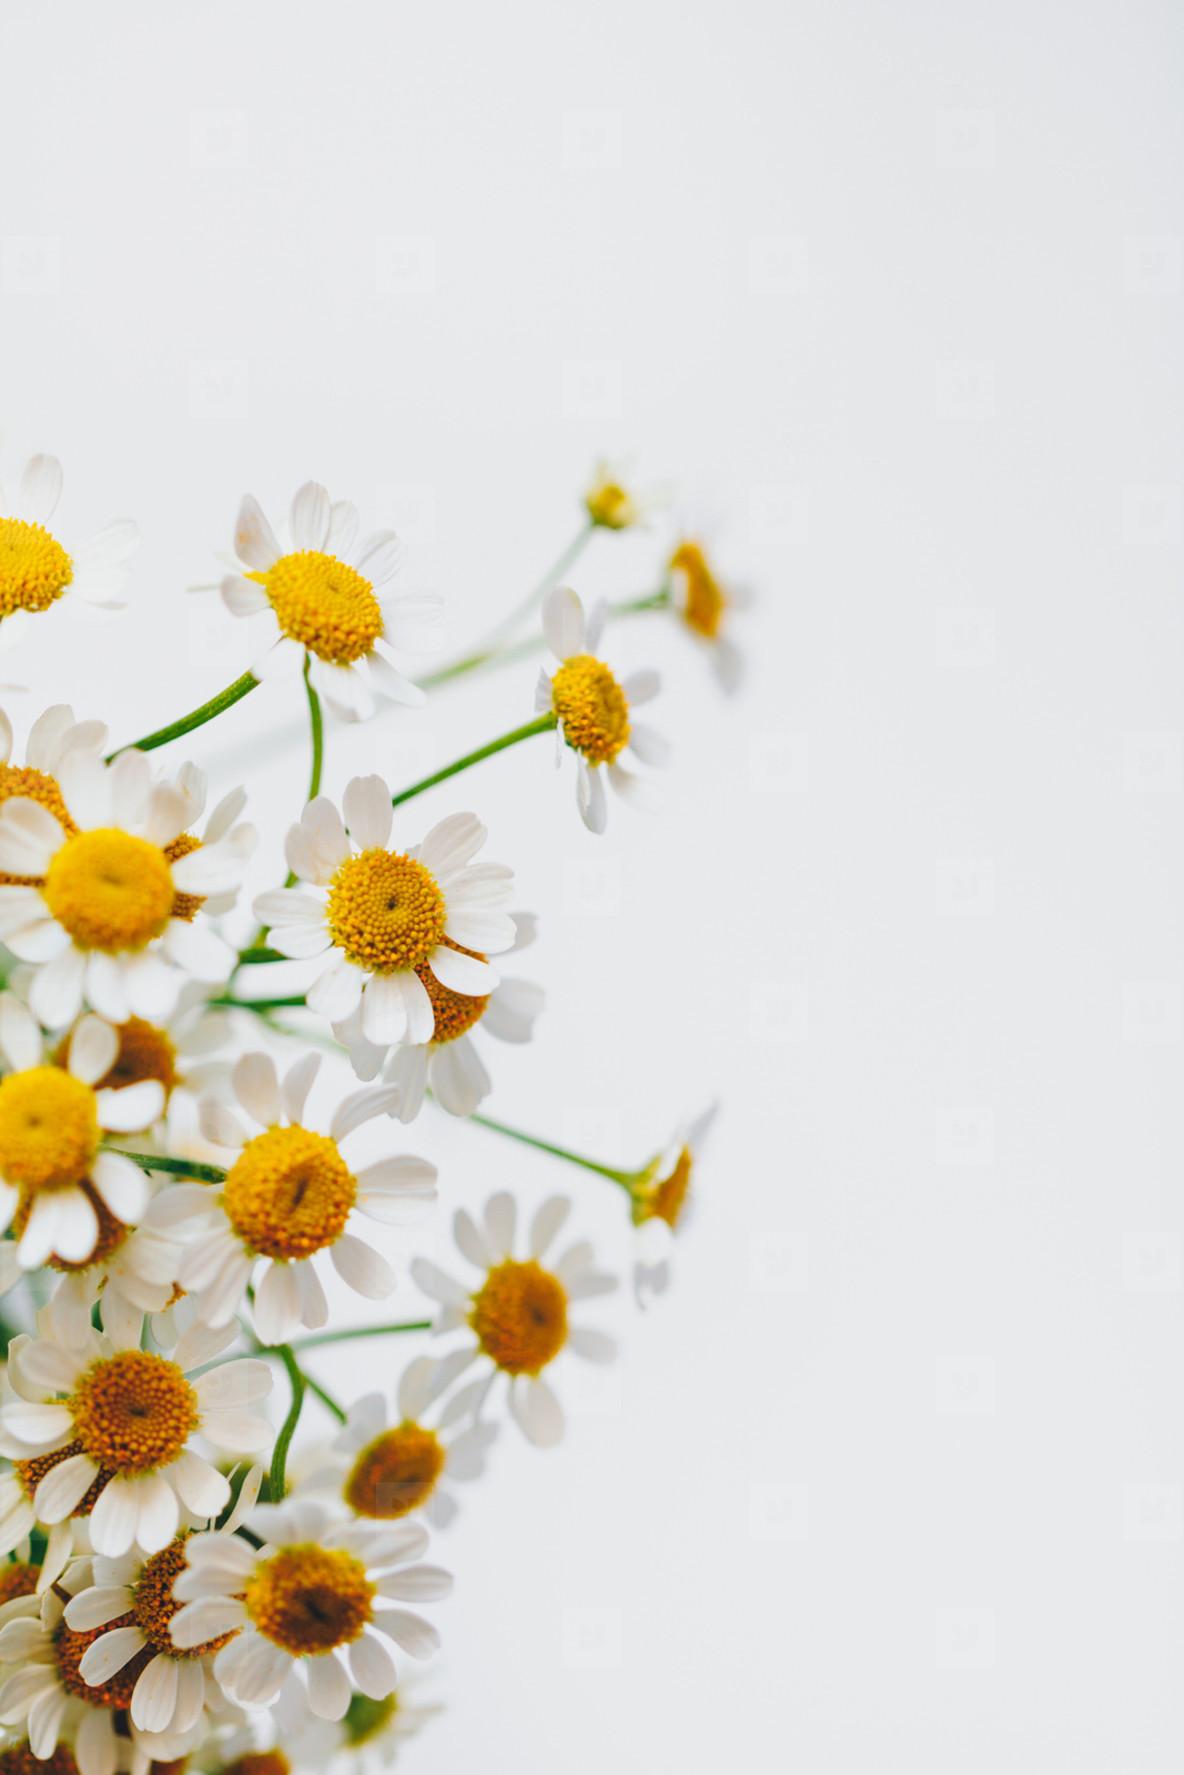 Little daisy flowers bouquet over white  Soft focus  top view  close up composition  Copy space